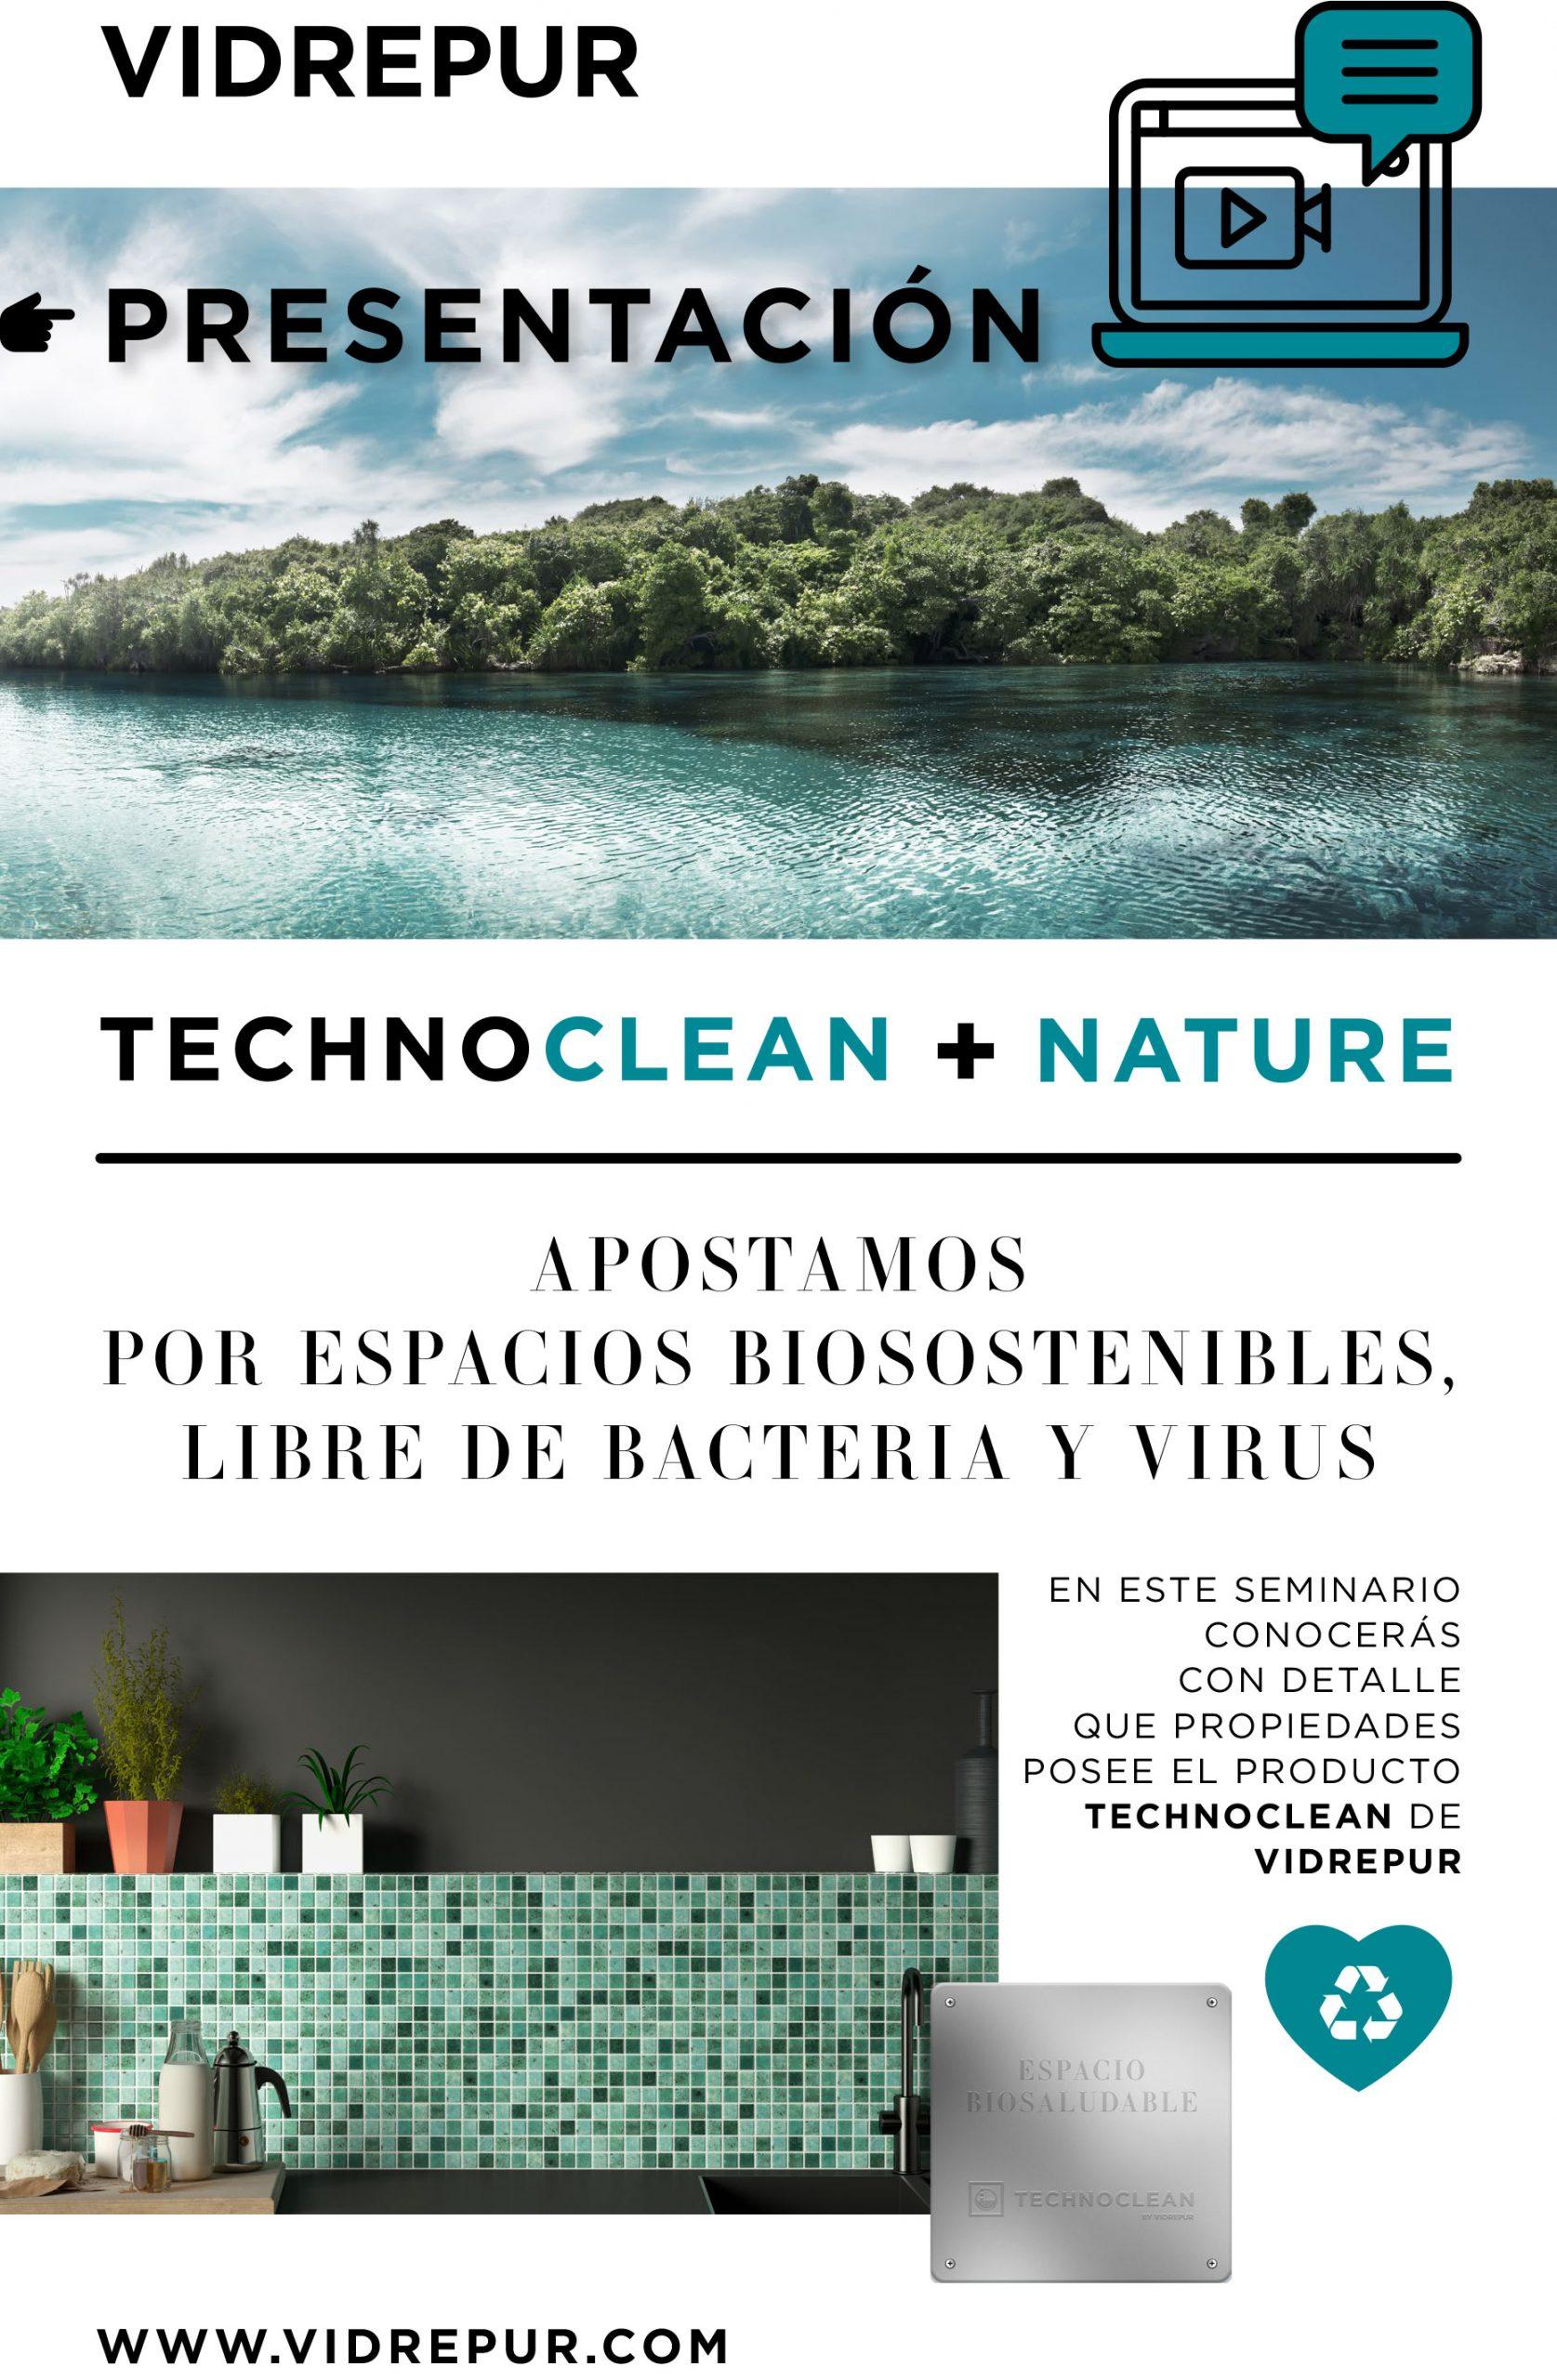 Webinar Nature Technoclean Es2 - Presentación Technoclean + Nature